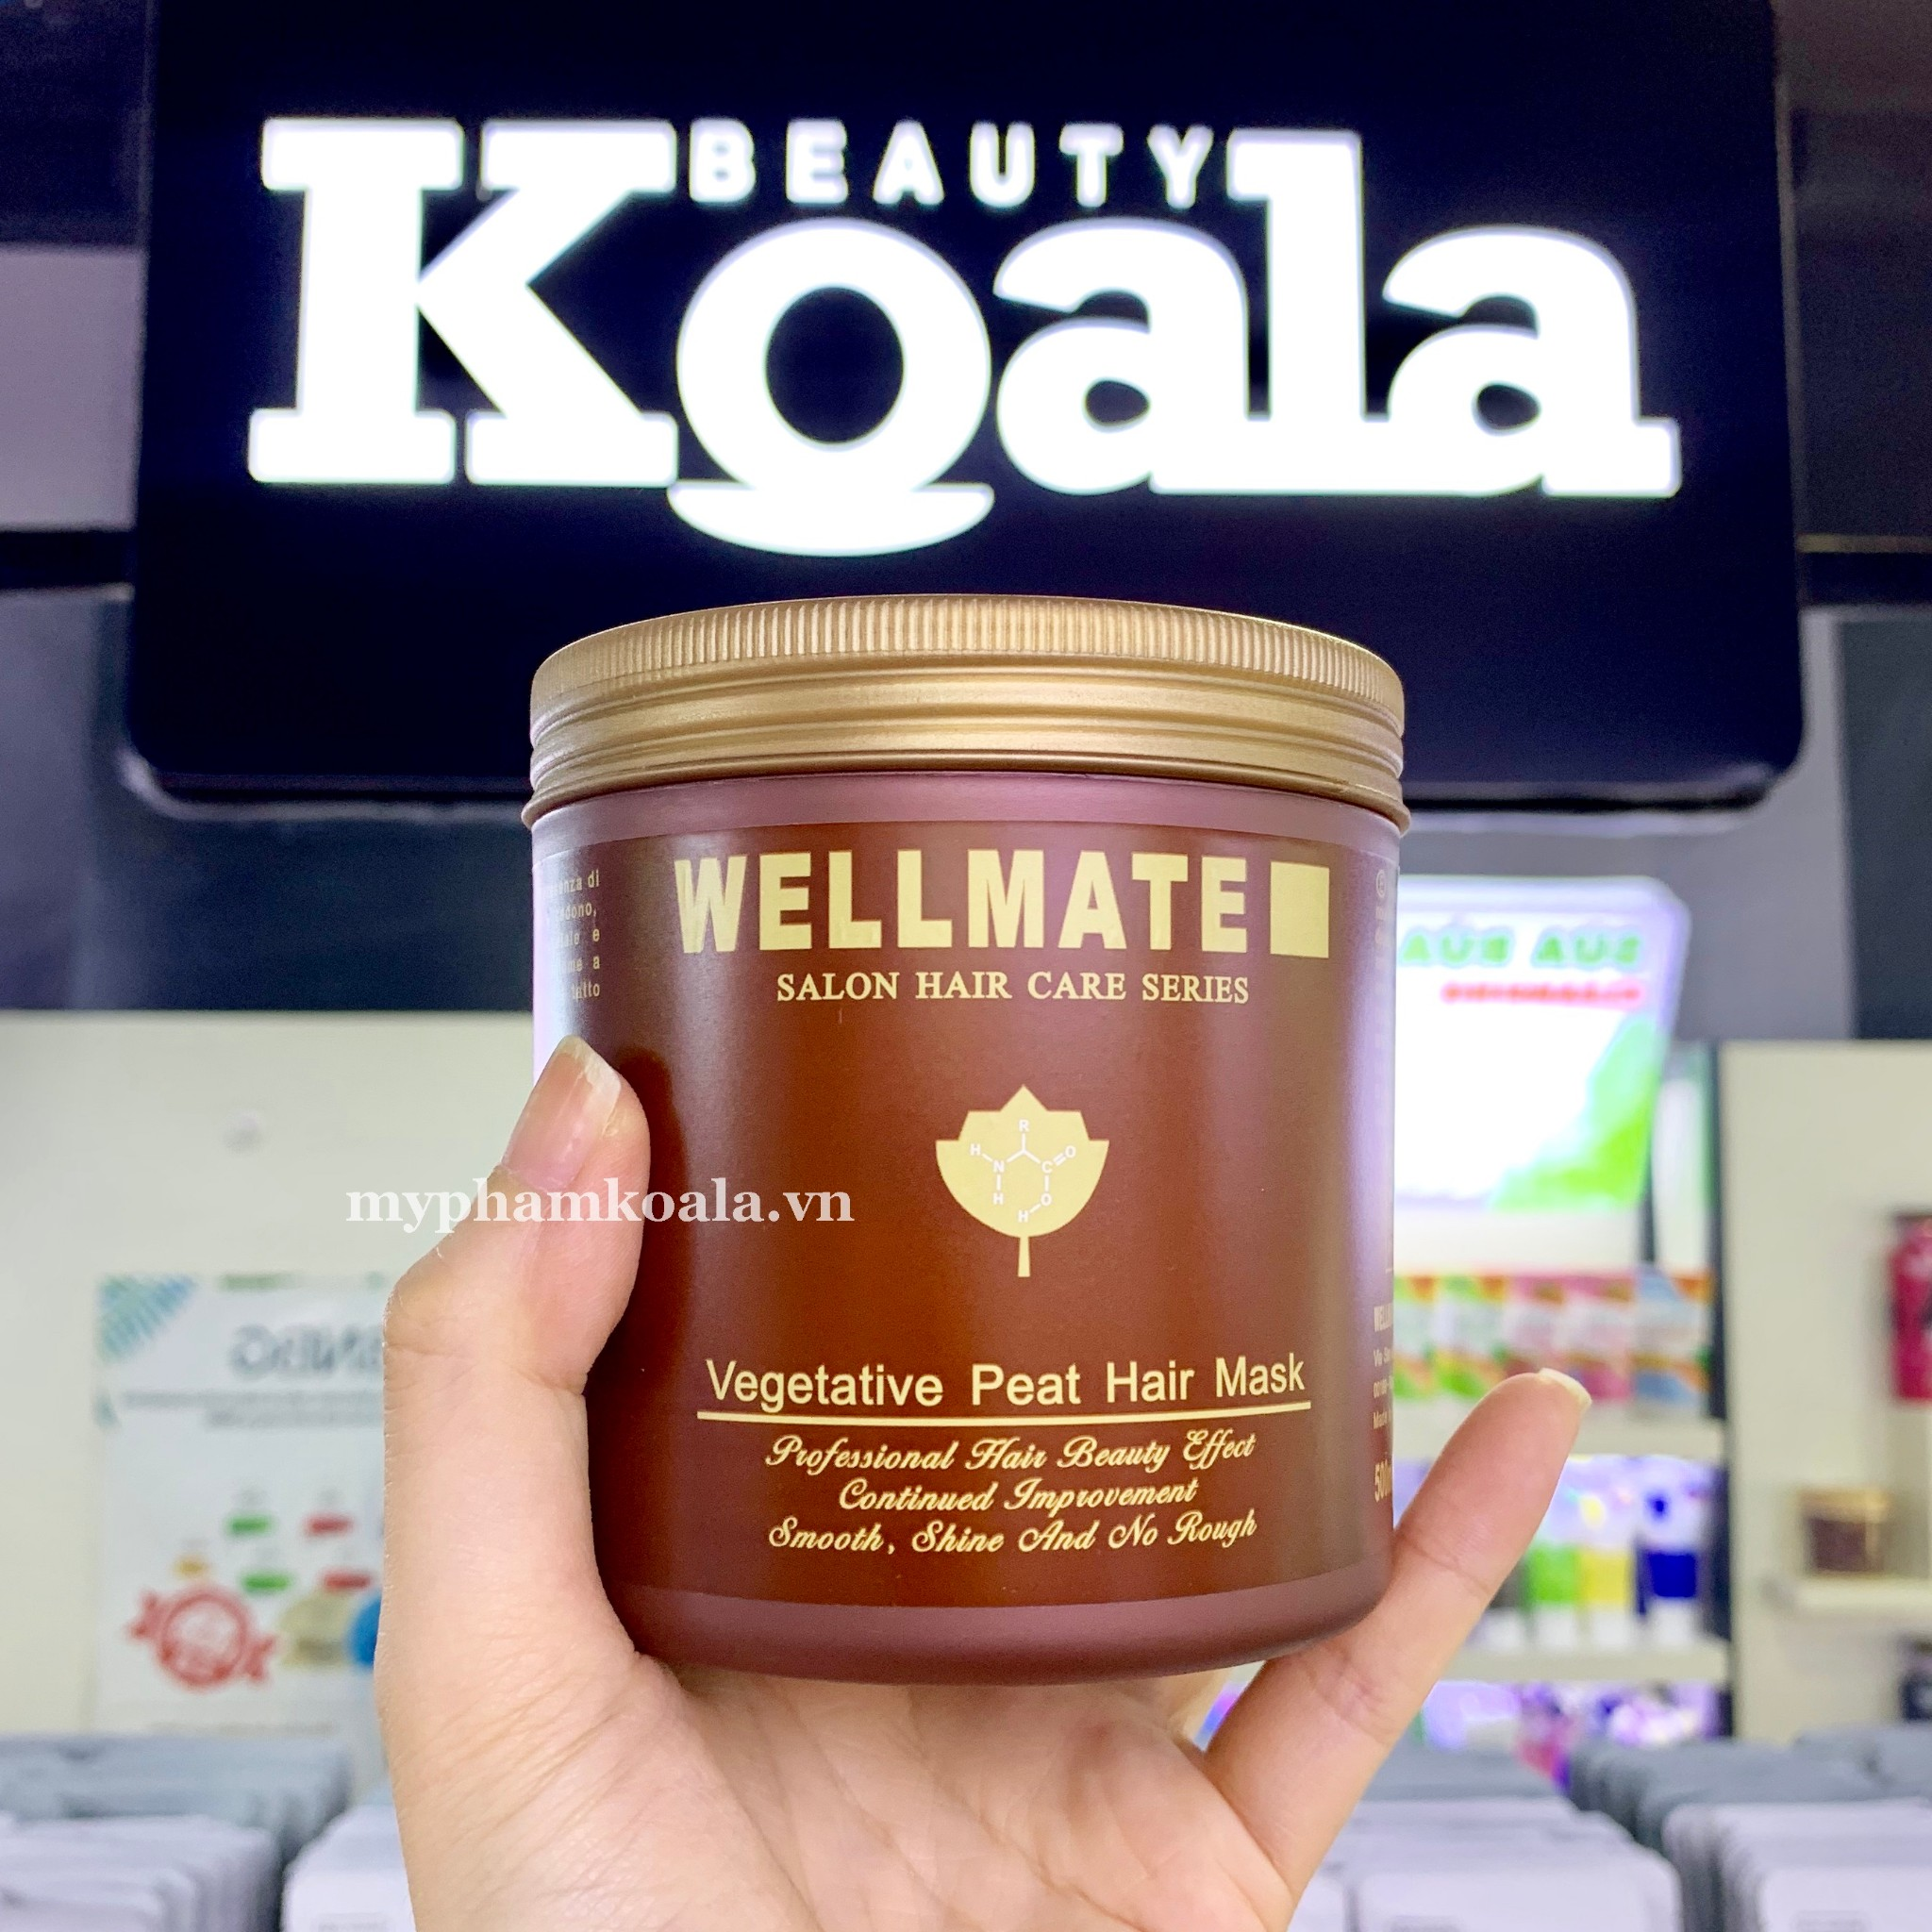 Kem Ủ Hấp Tóc Thảo Dược Wellmate Vegetative Peat Hair Mask 500ml